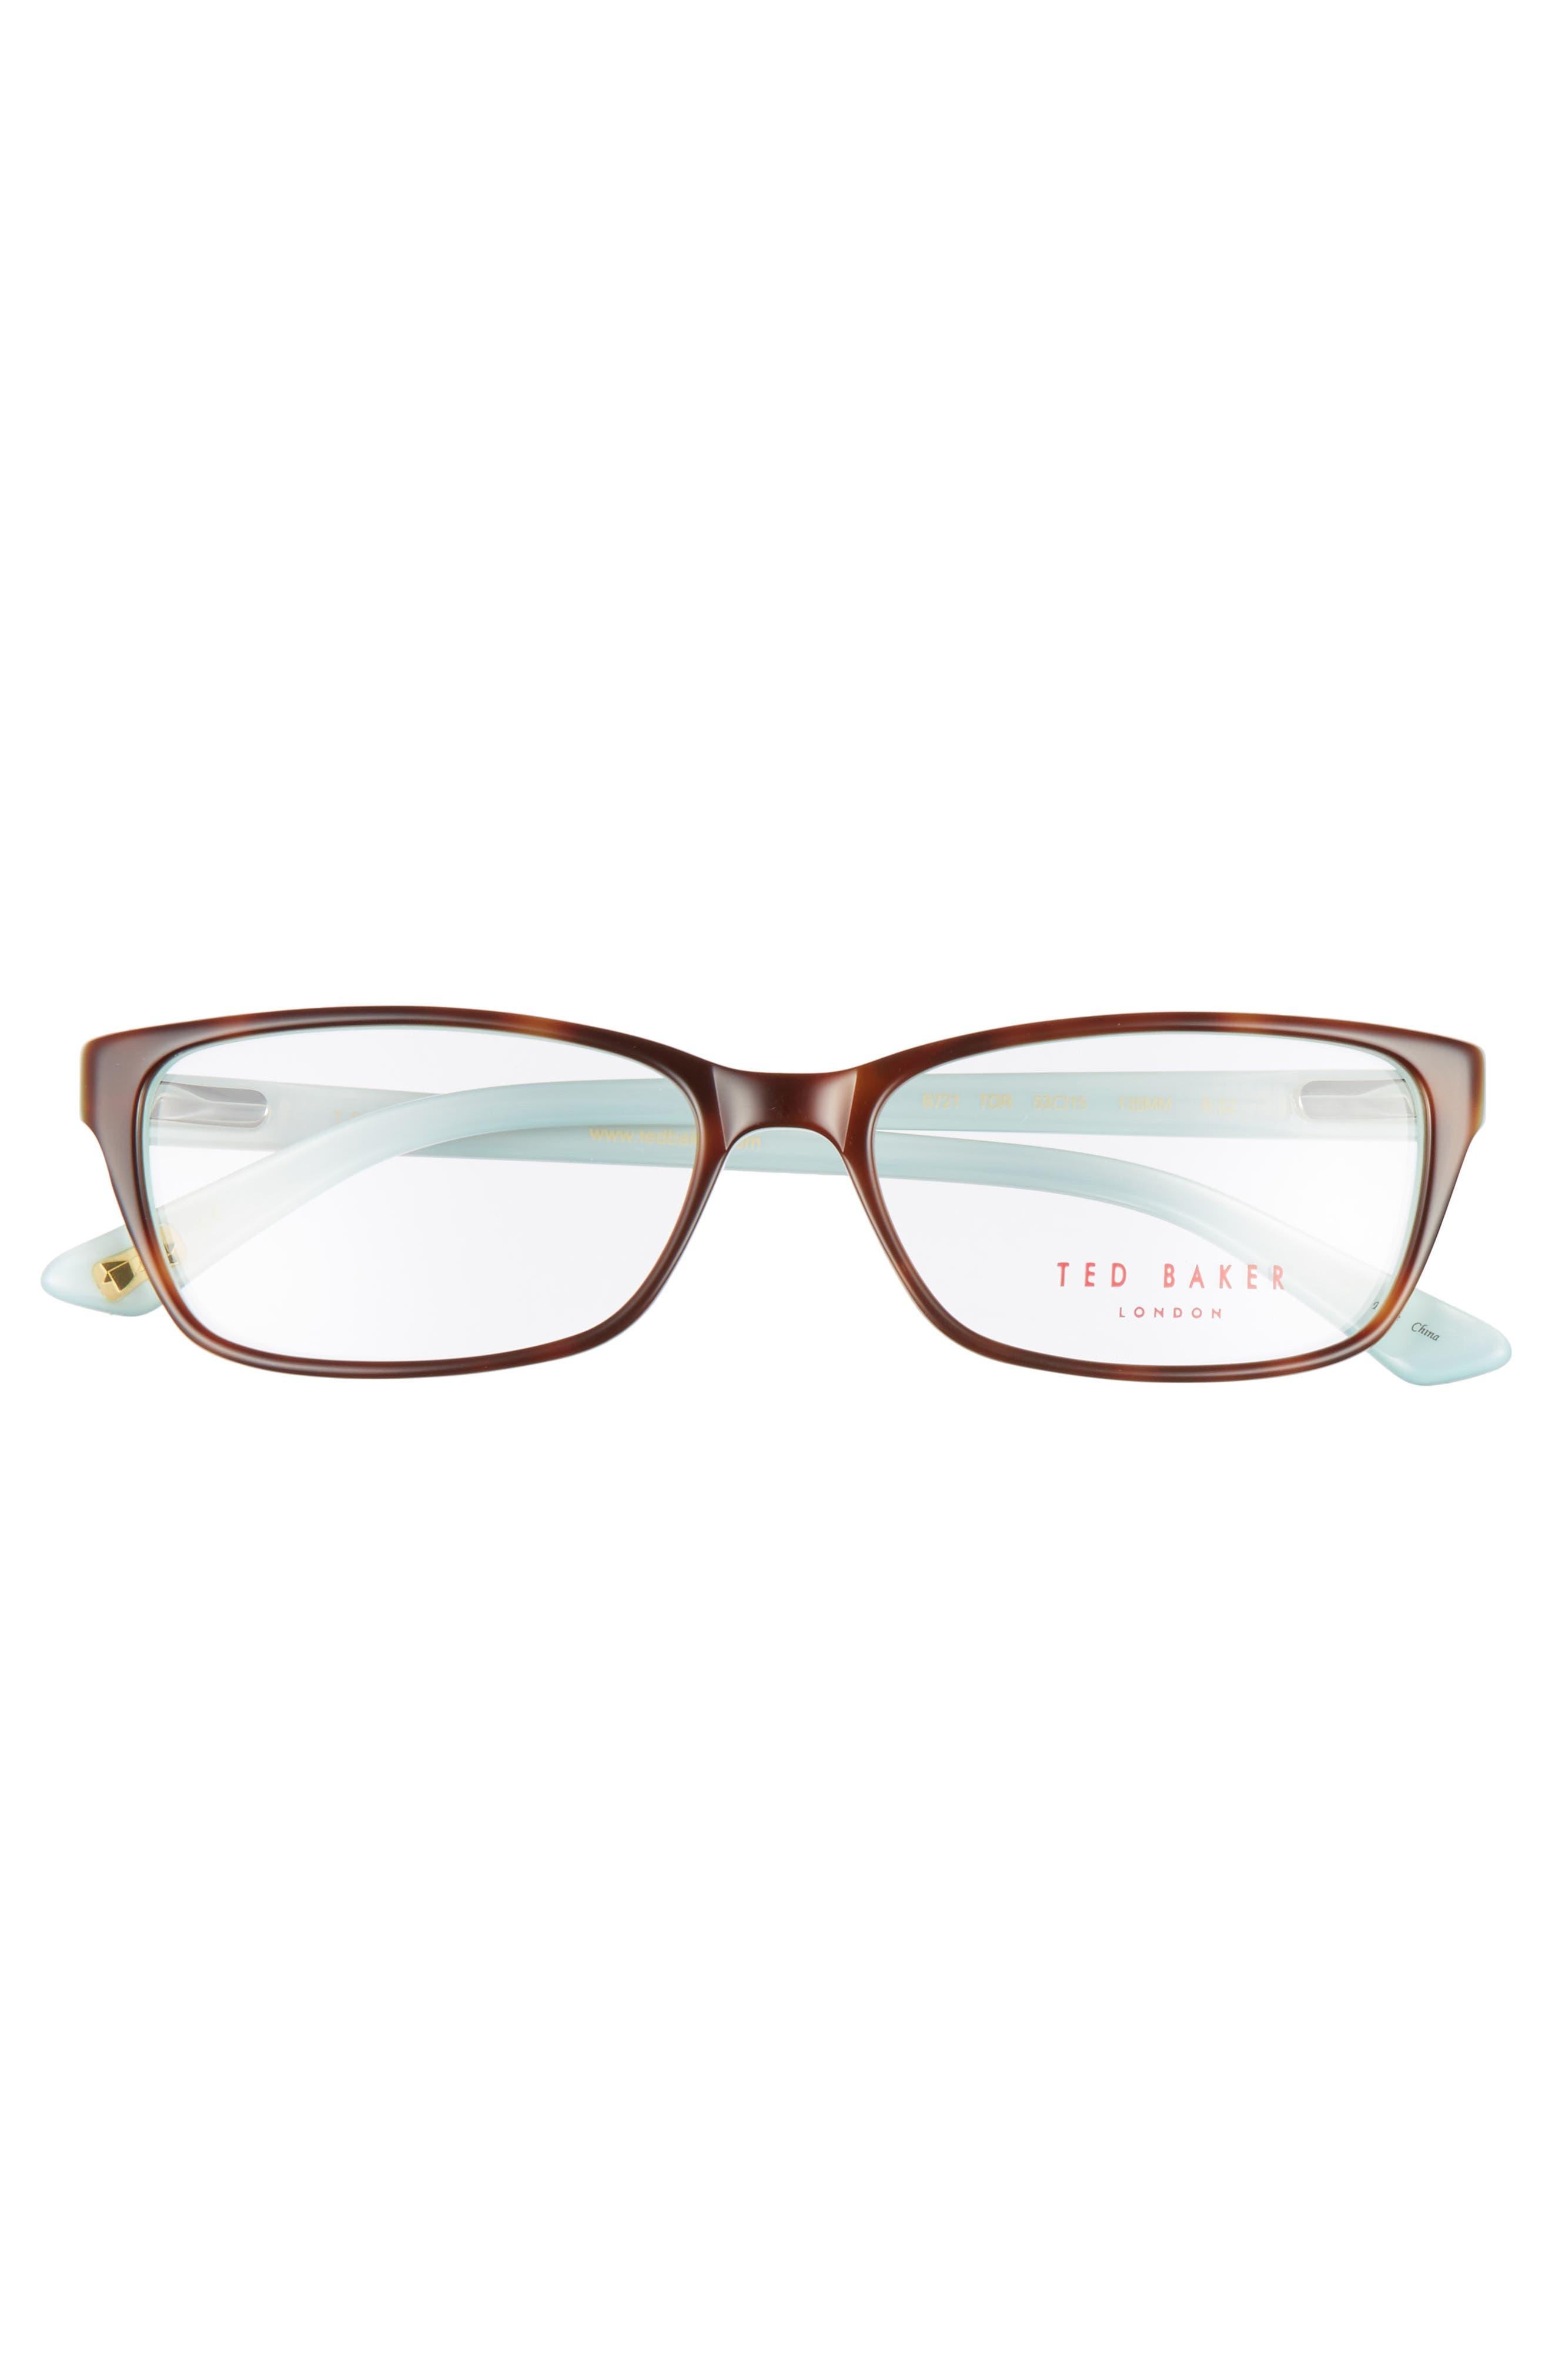 53mm Optical Glasses,                             Alternate thumbnail 6, color,